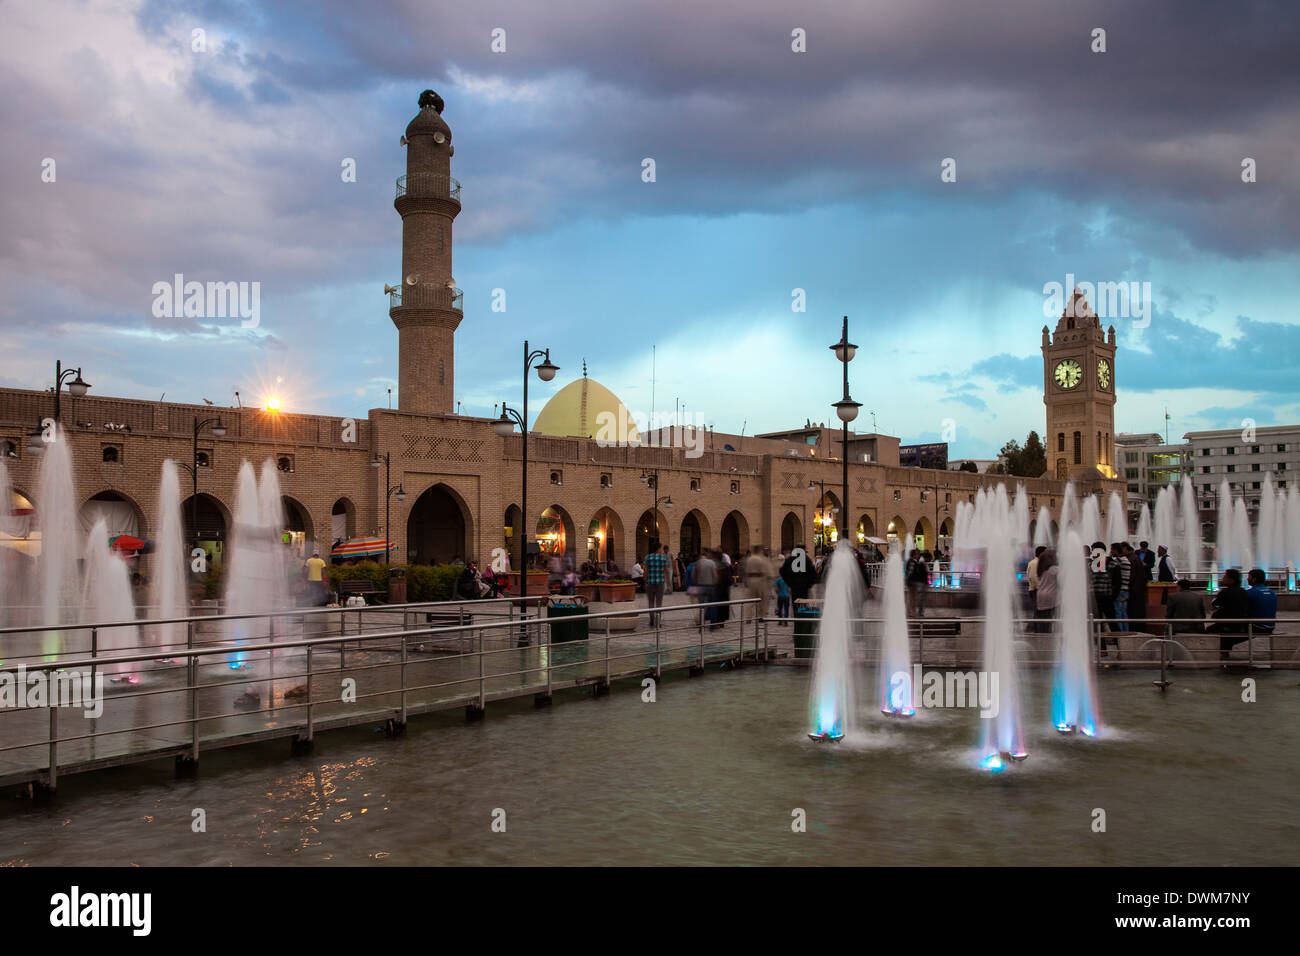 Shar Park, Clock tower and Qaysari Bazaars, Erbil, Kurdistan, Iraq, Middle East - Stock Image